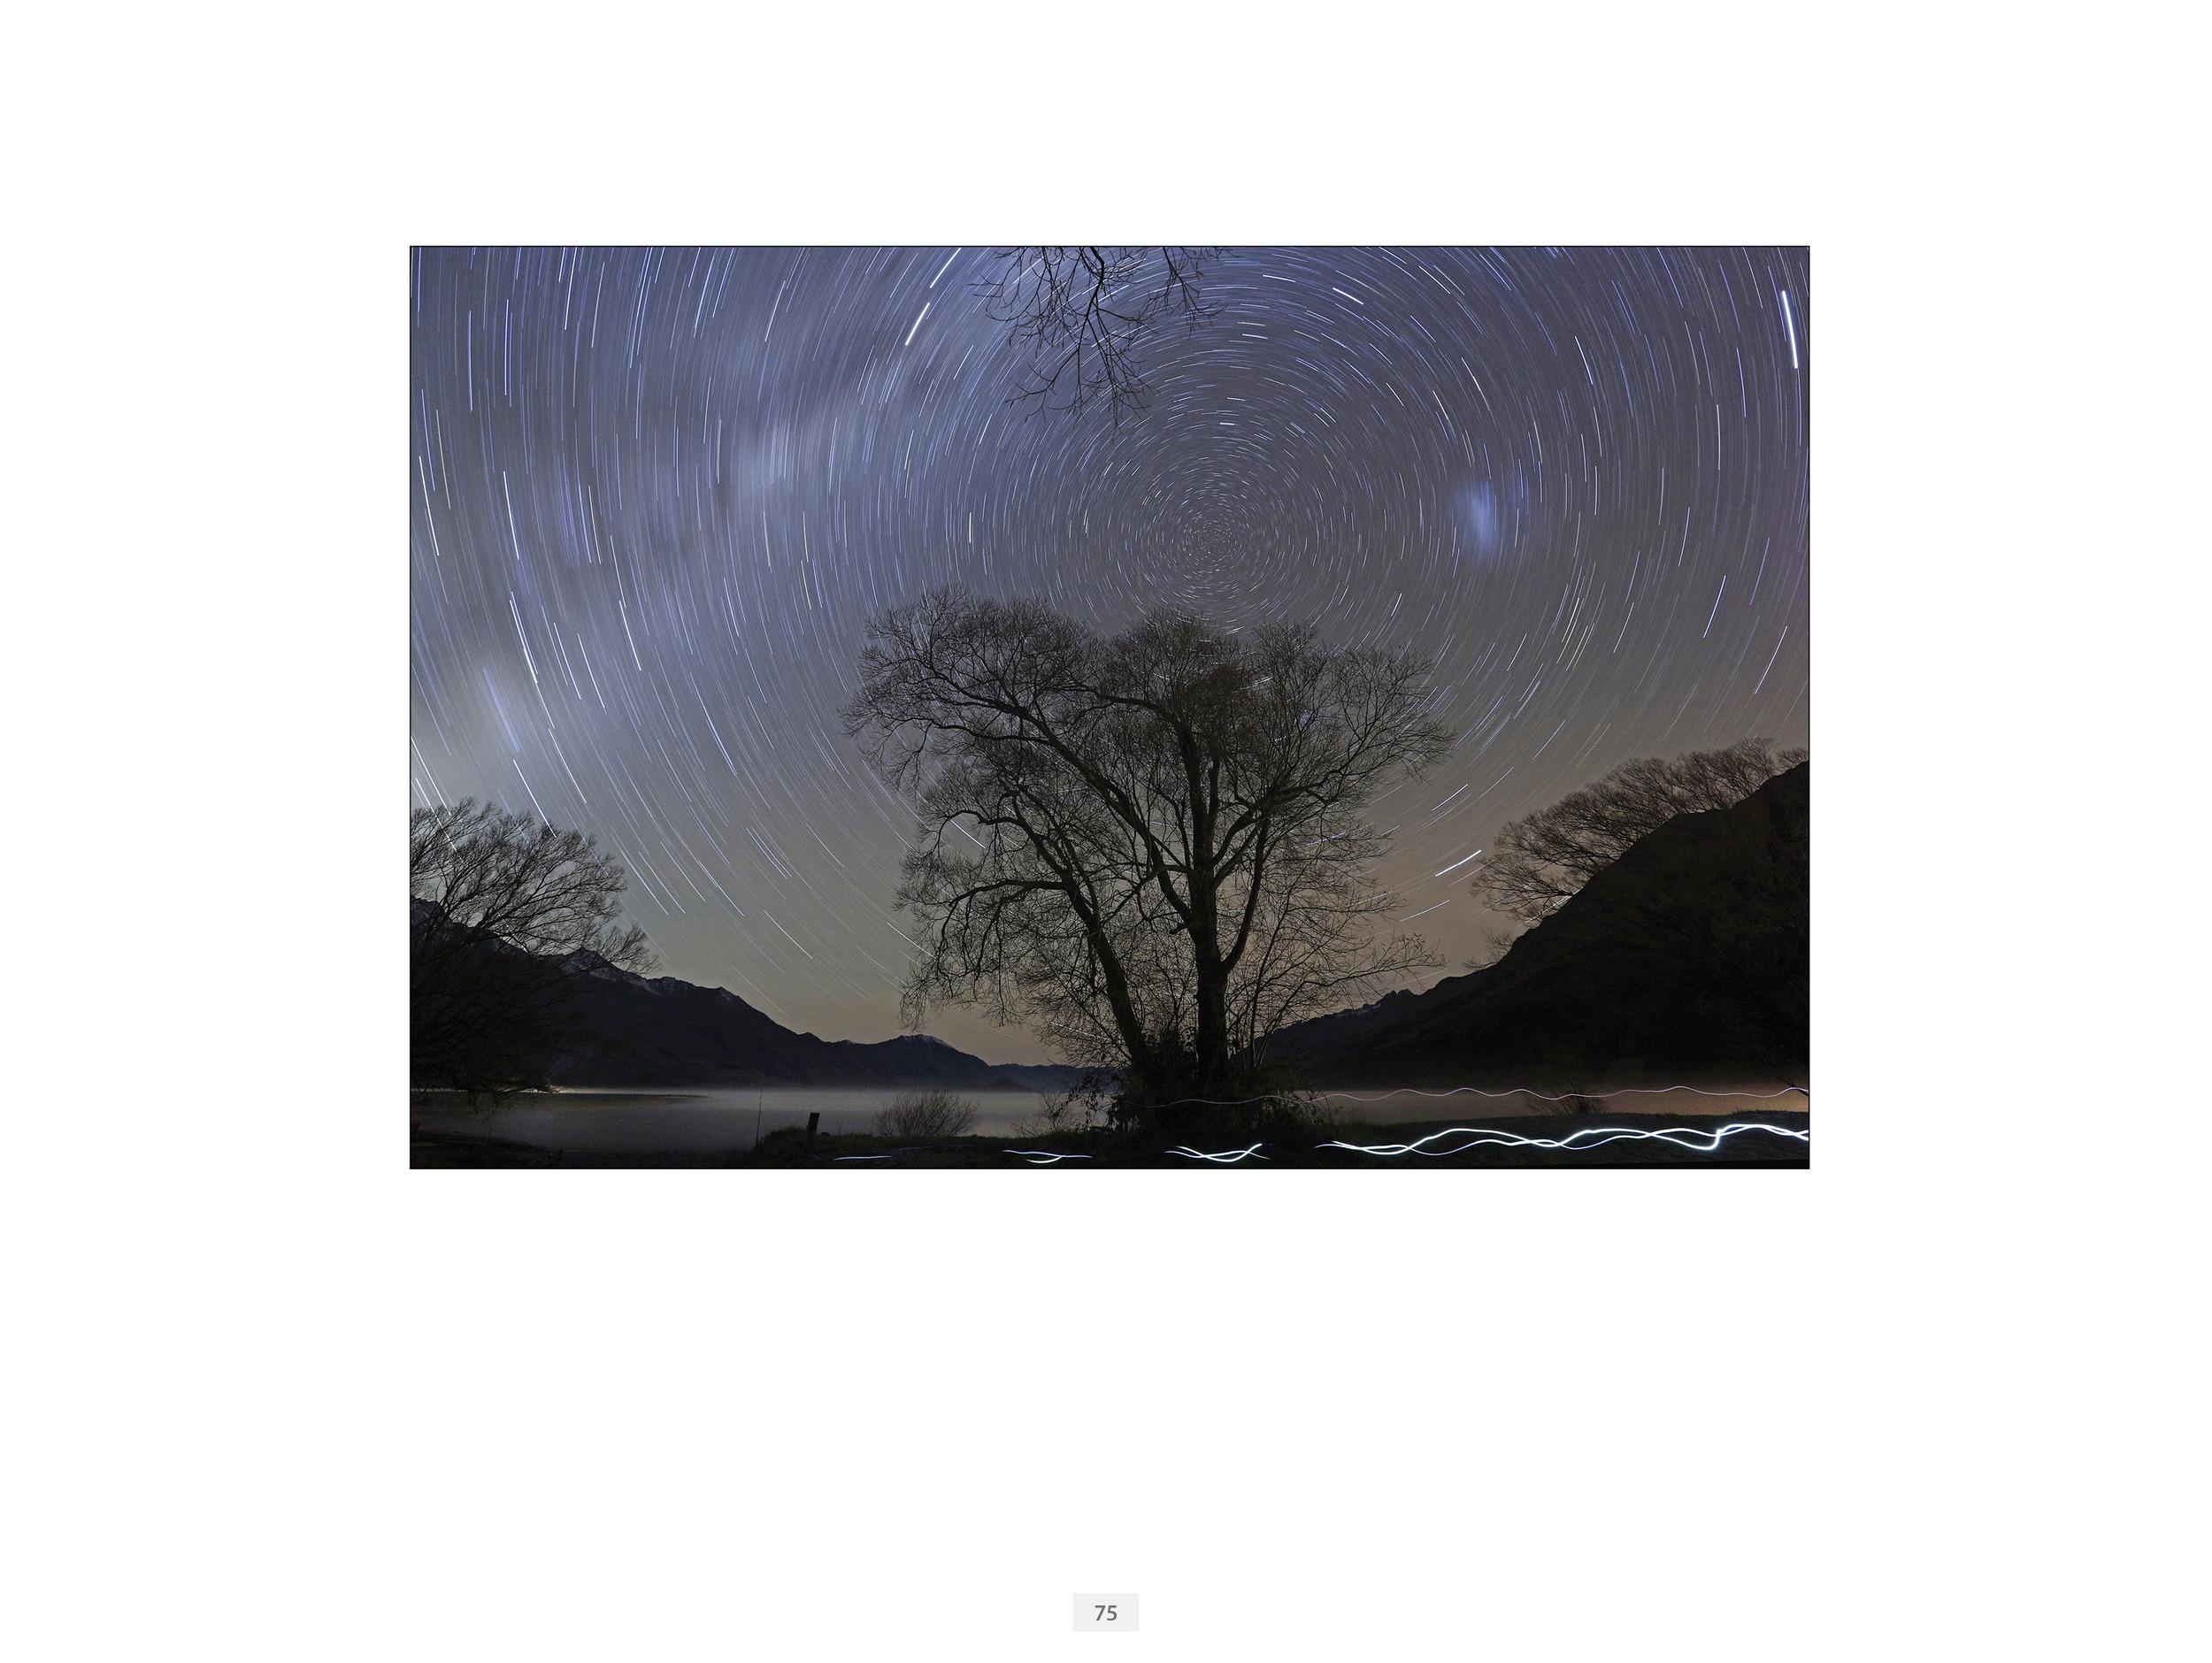 LG2 ebook for Flatbooks p 75 Startrails.jpg